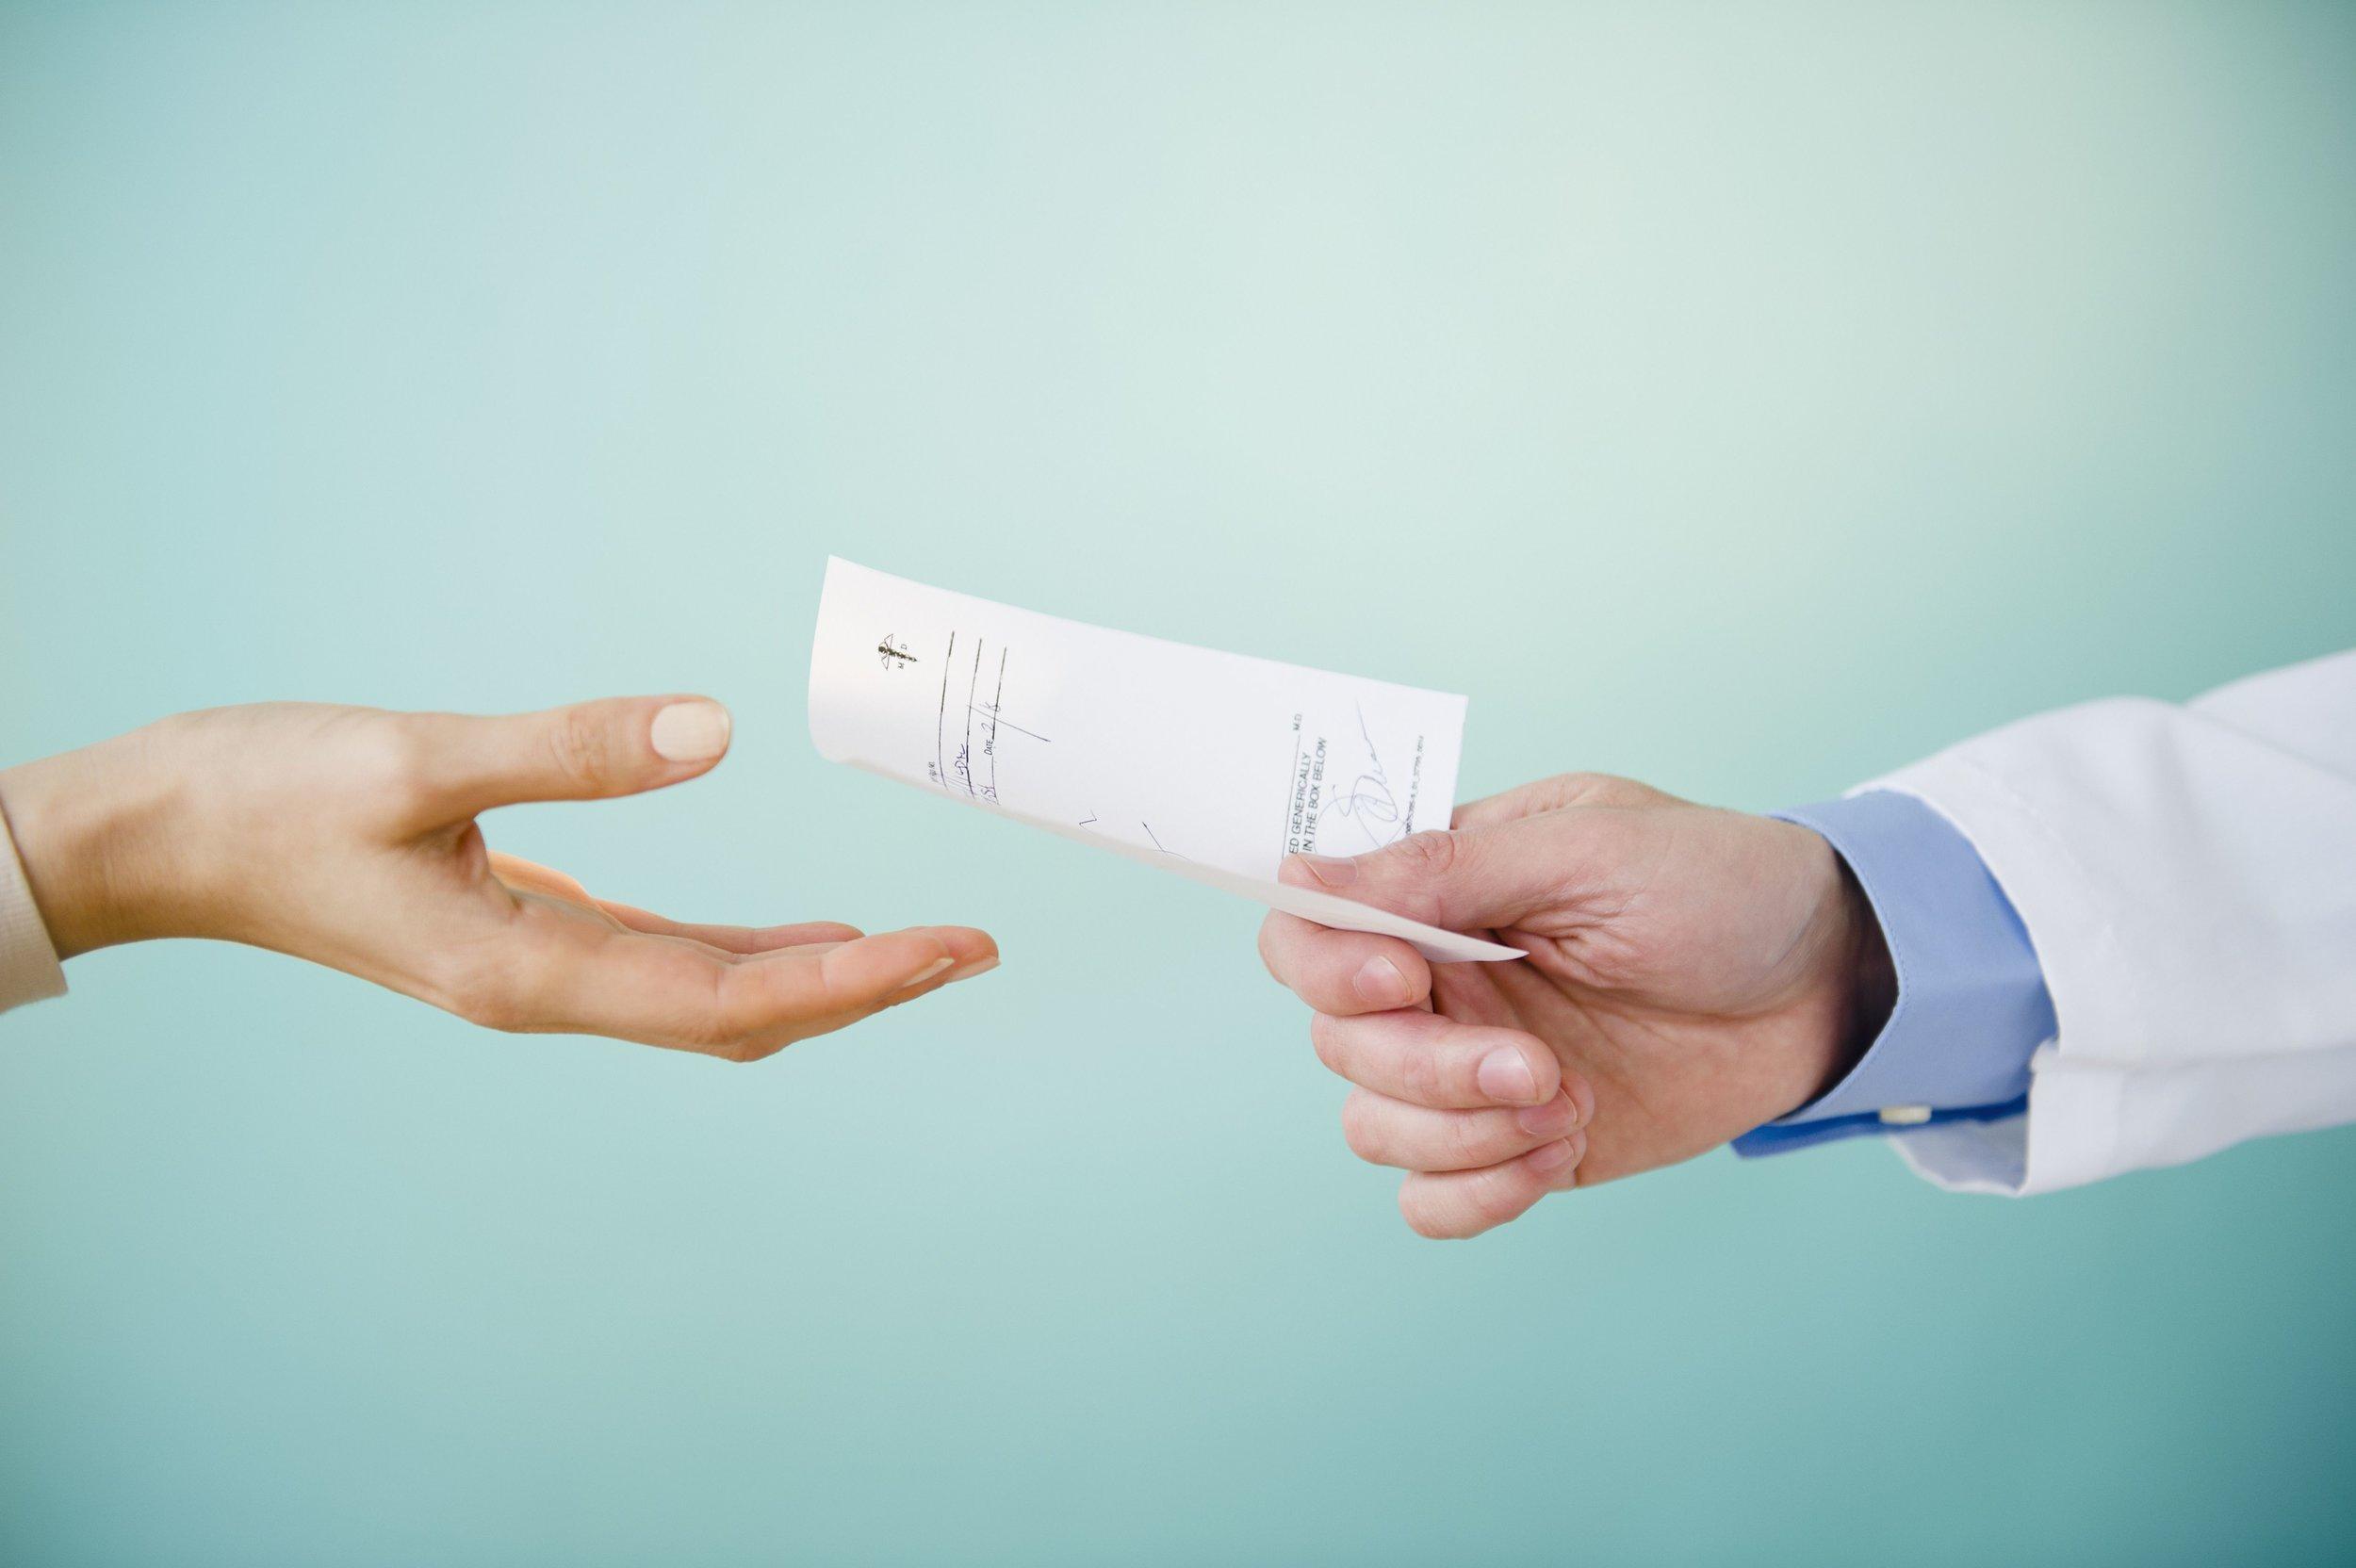 close-up-of-doctor-s-hand-giving-prescription-to-patient-studio-shot-149262483-5877e1b73df78c17b62c3376.jpg